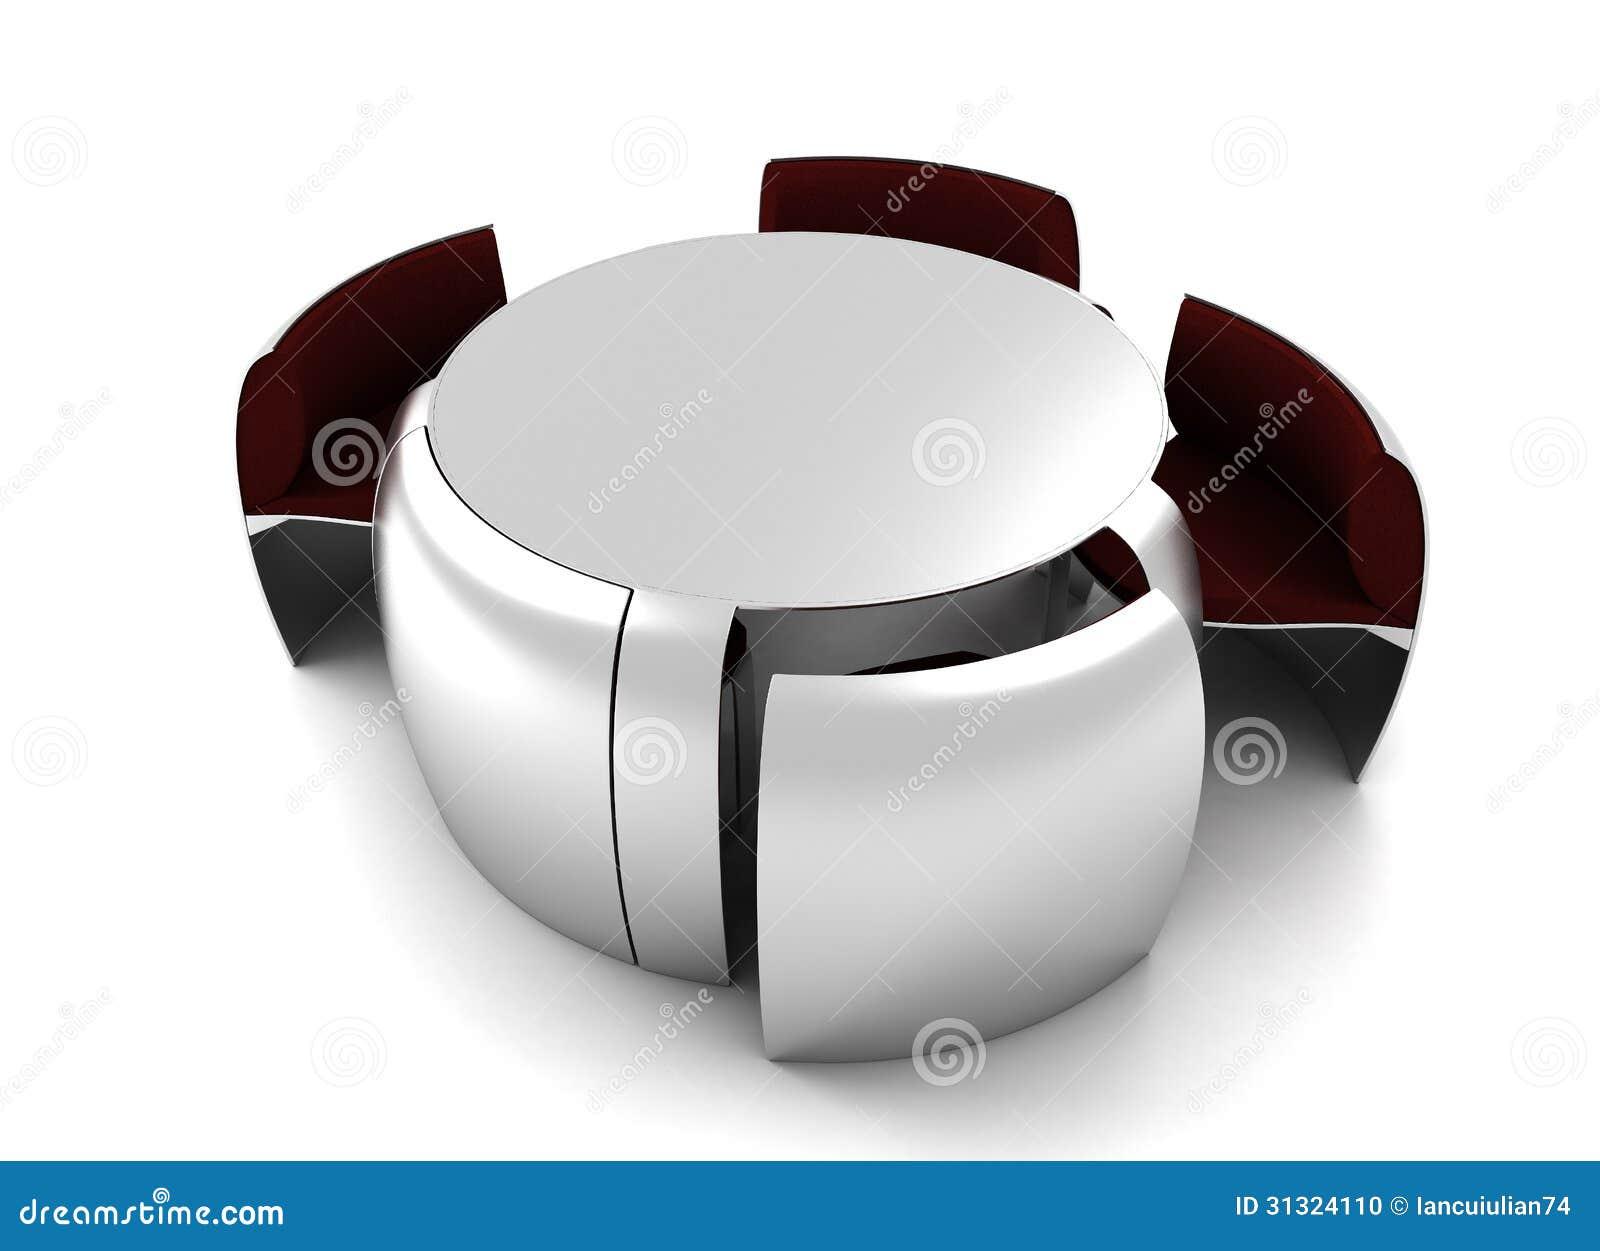 Furniture Design Table Render Stock Photo Image 31324110